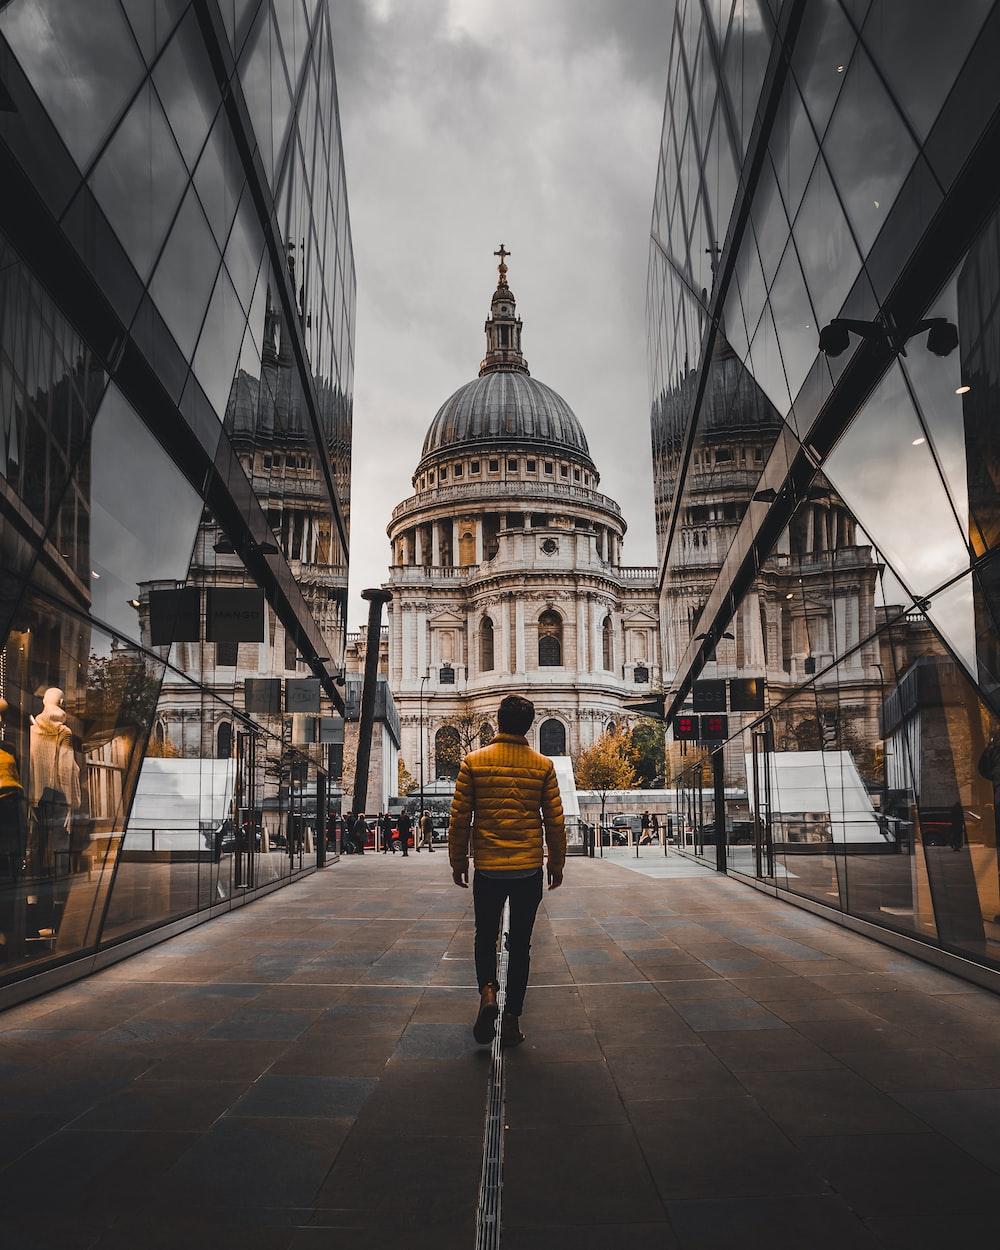 man standing between buildings during daytime